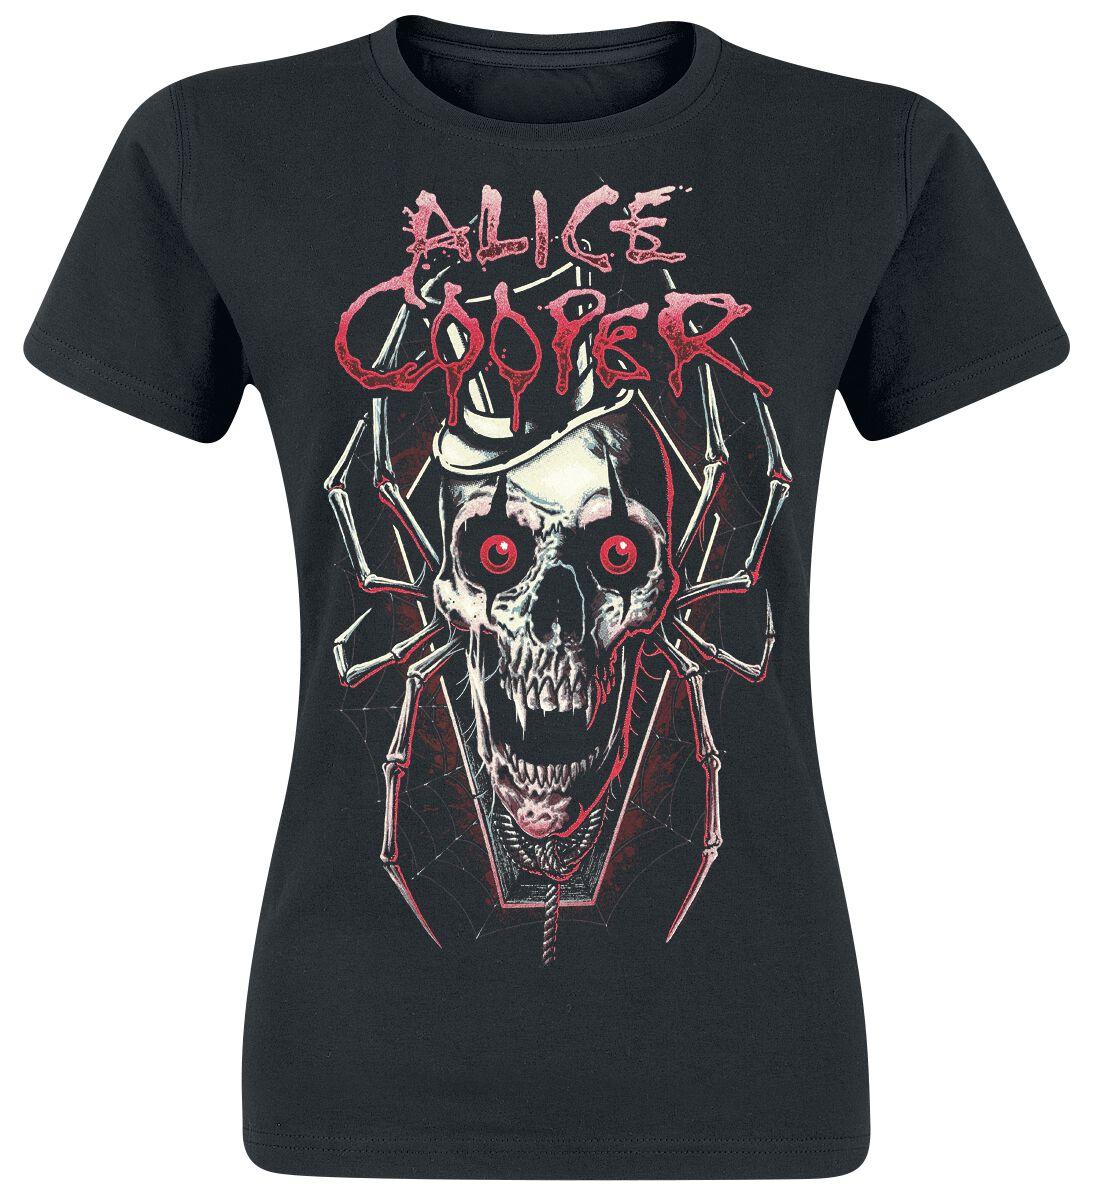 Zespoły - Koszulki - Koszulka damska Alice Cooper Skull Spider Koszulka damska czarny - 366339